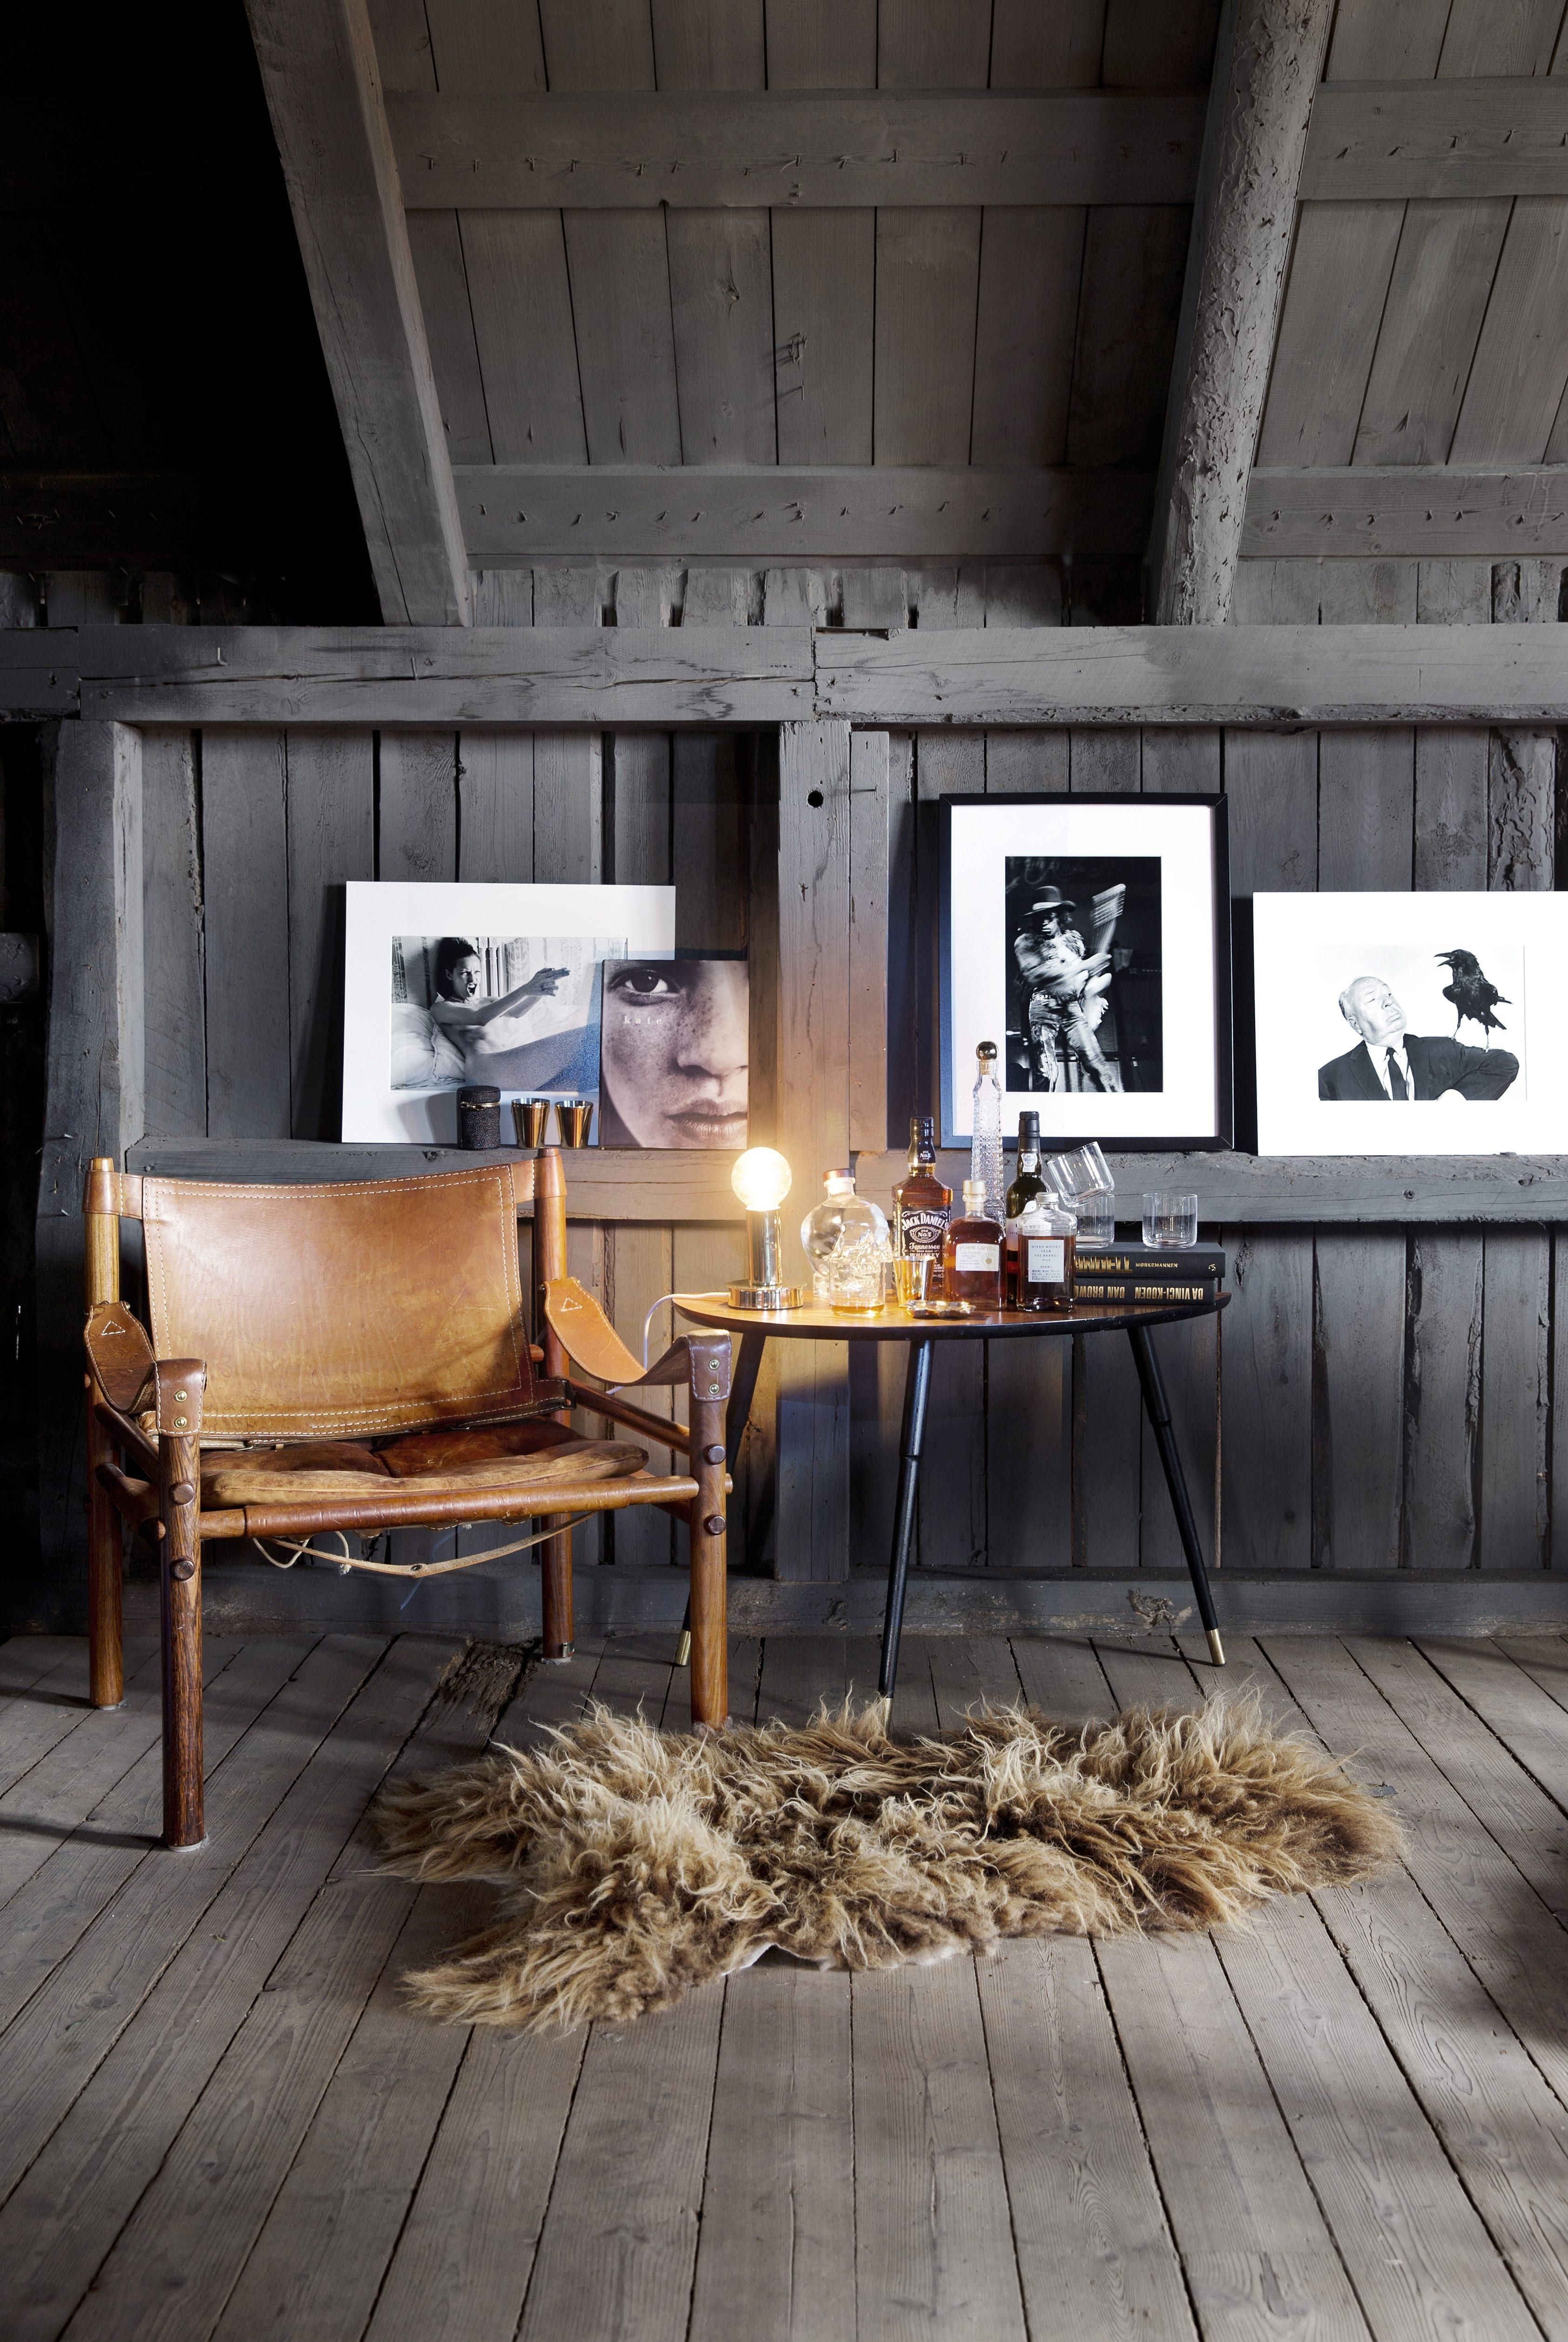 Jul hos Camilla/Milla boutique | Cool Juxtaposition! | Pinterest